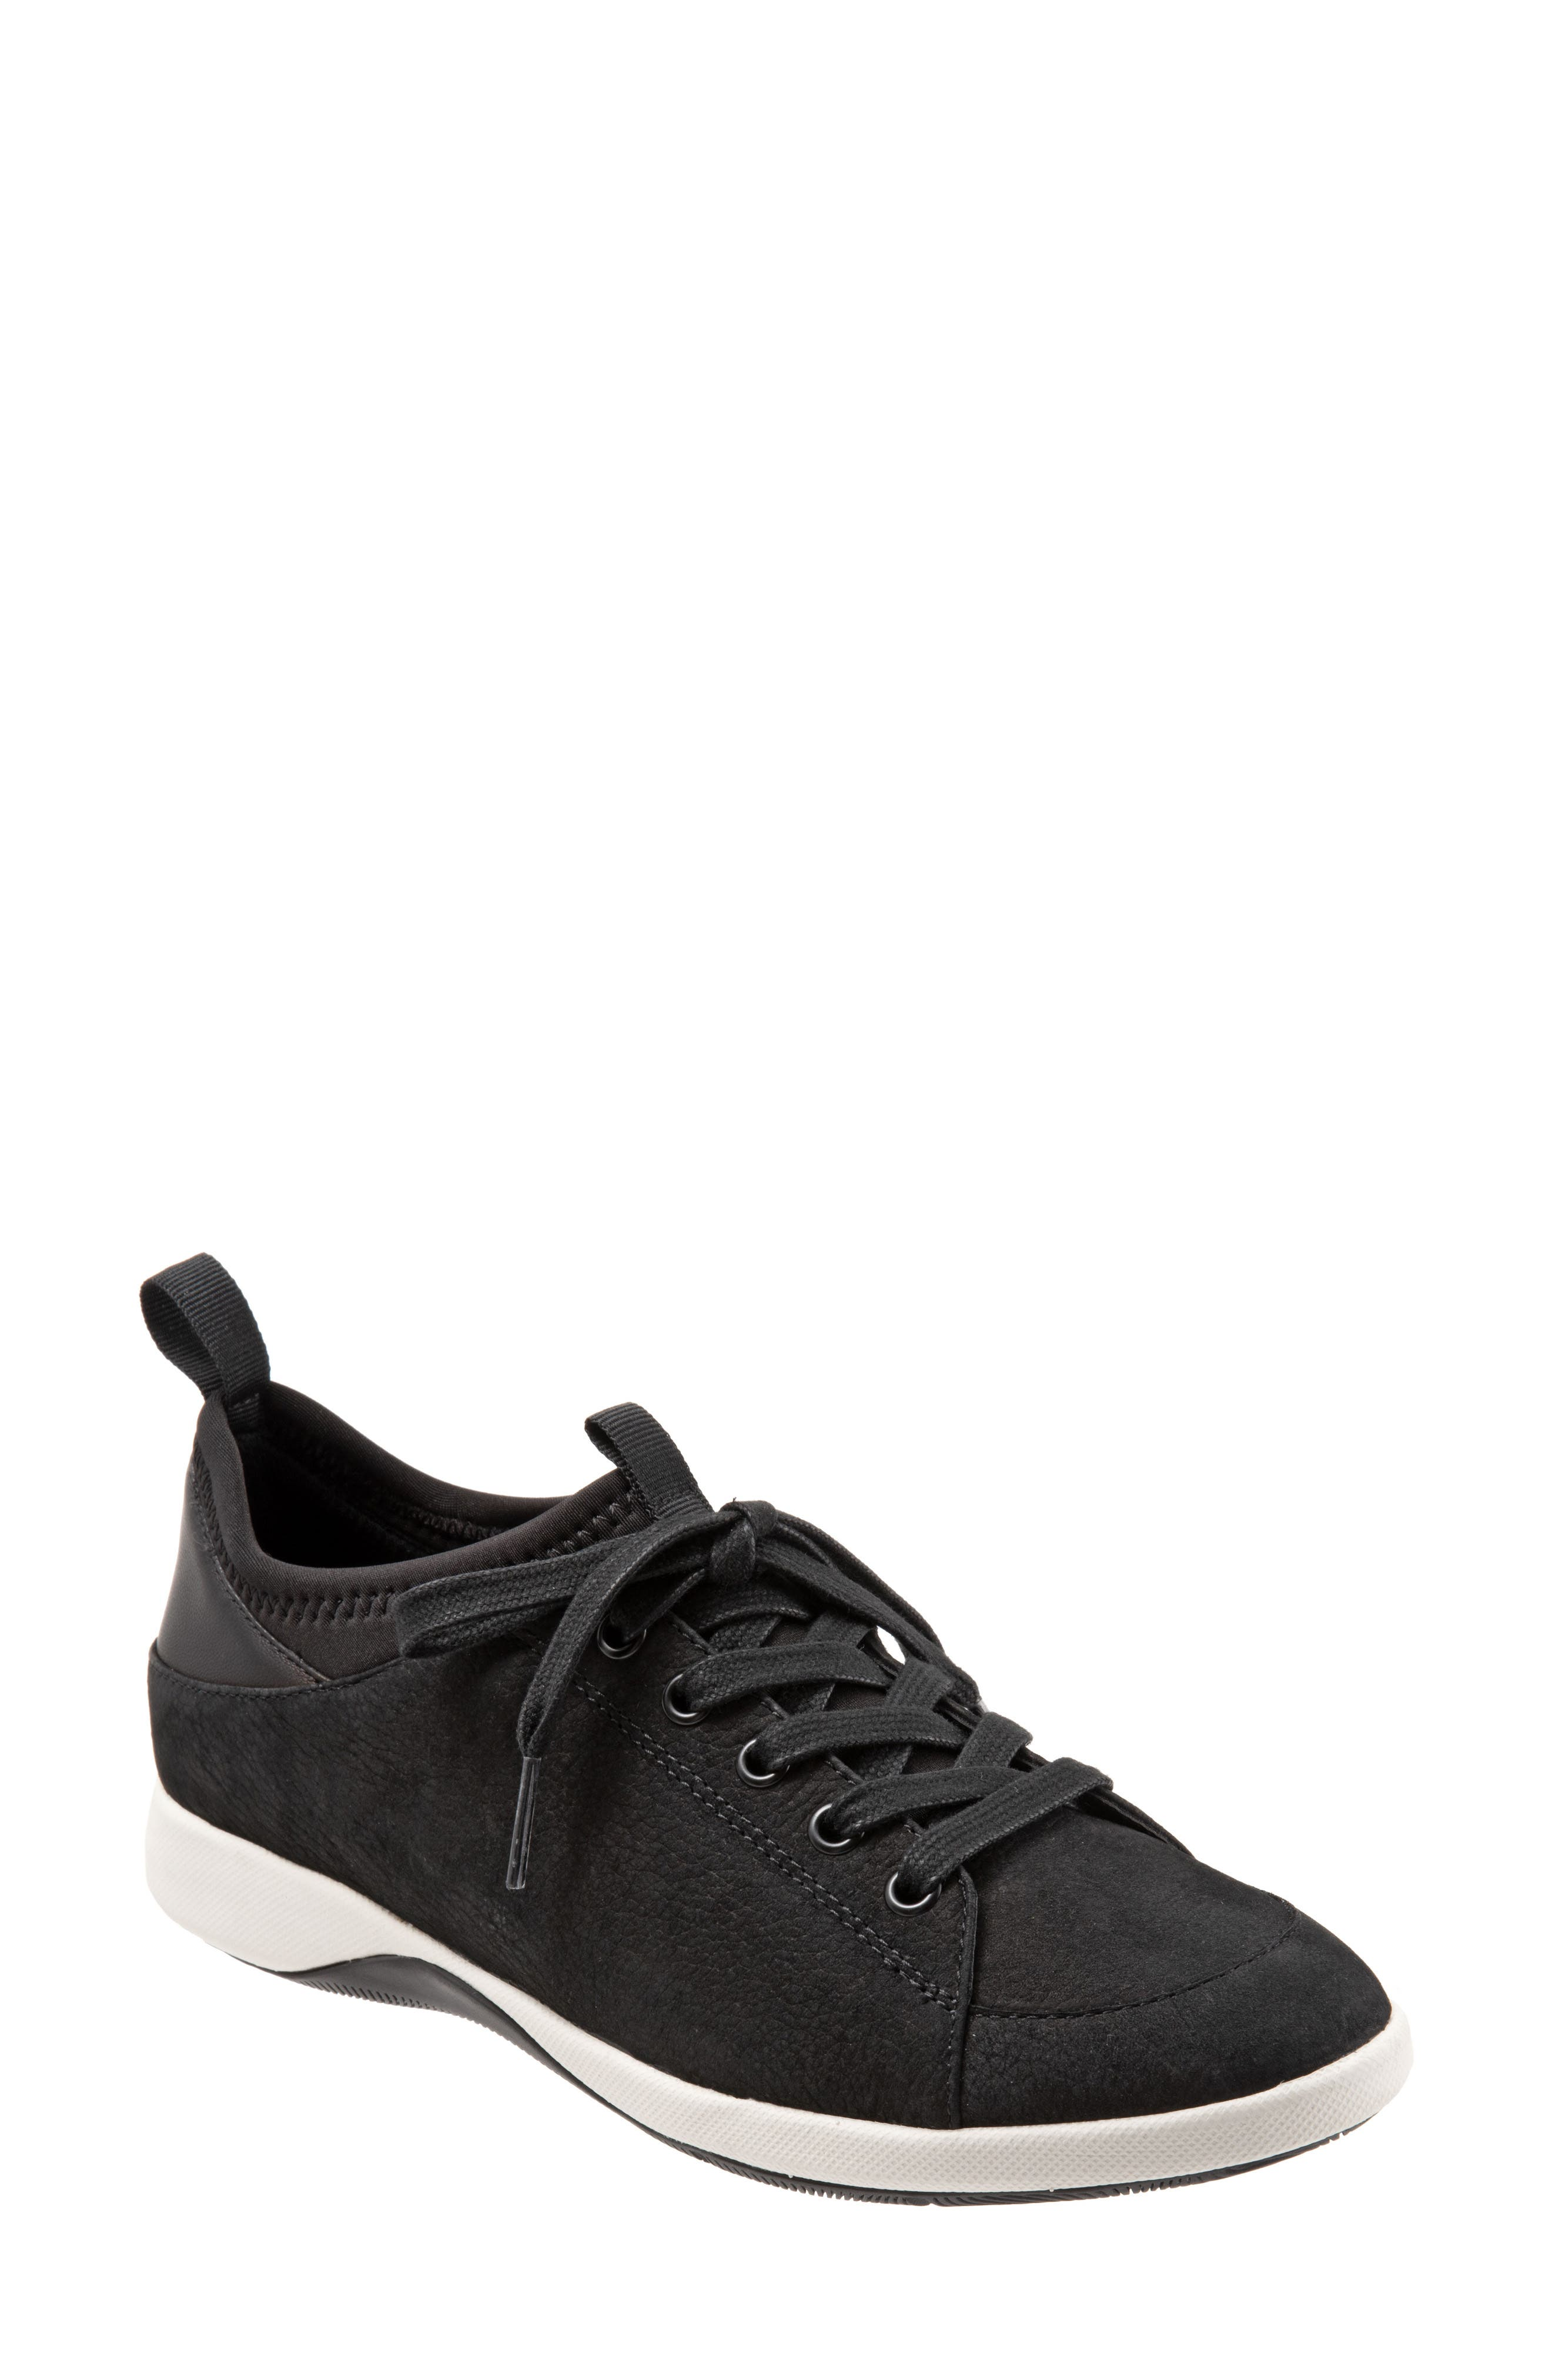 Softwalk Sava Haven Sneaker, Black